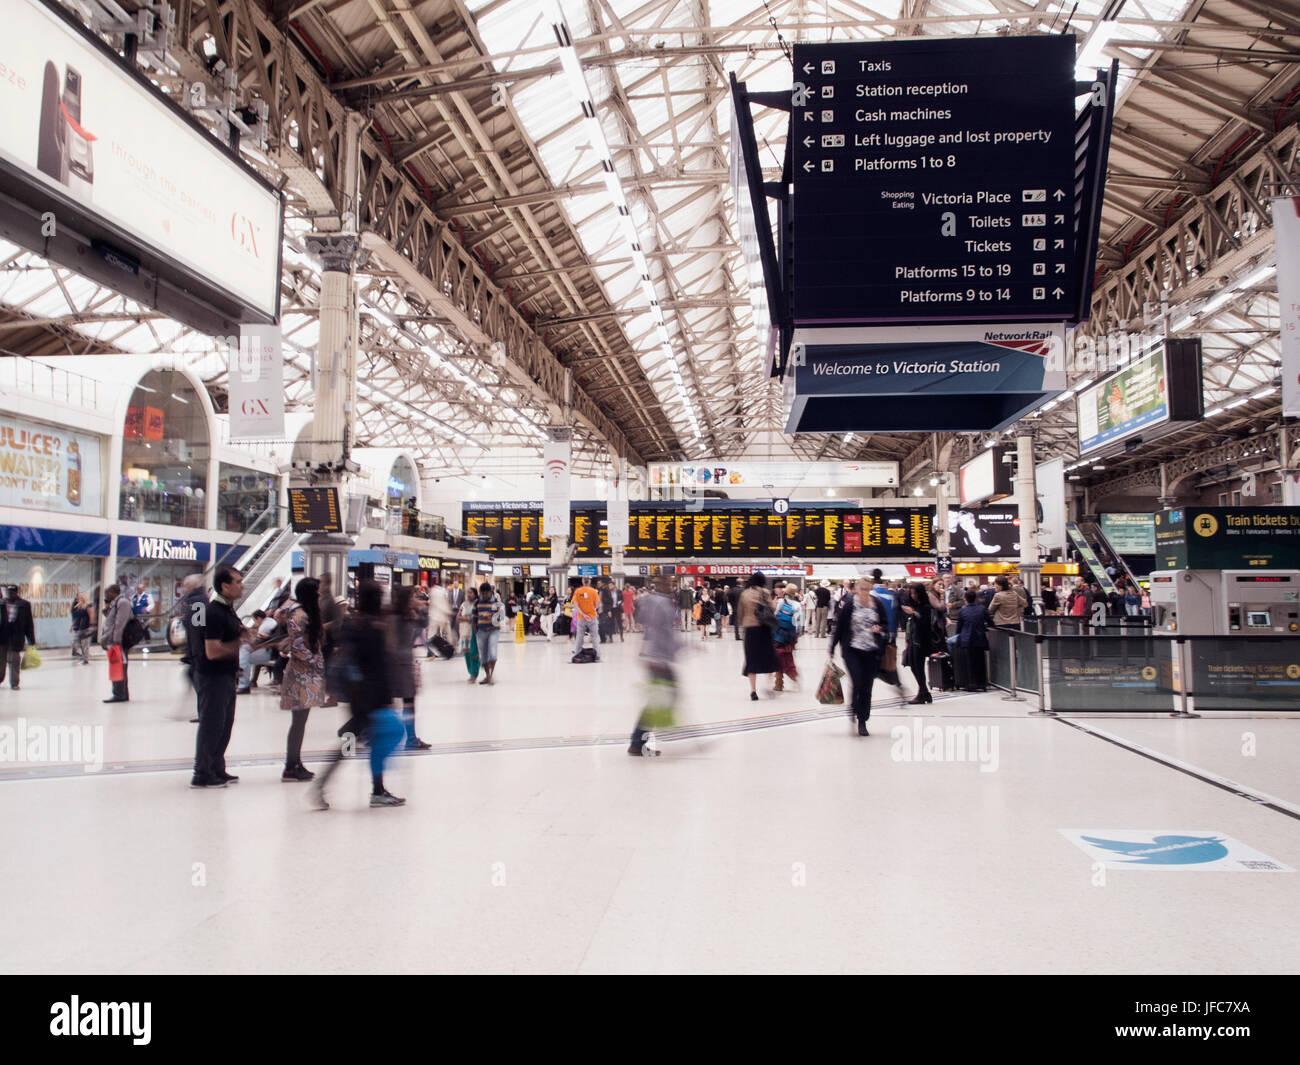 Victoria Train Station - London - Stock Image